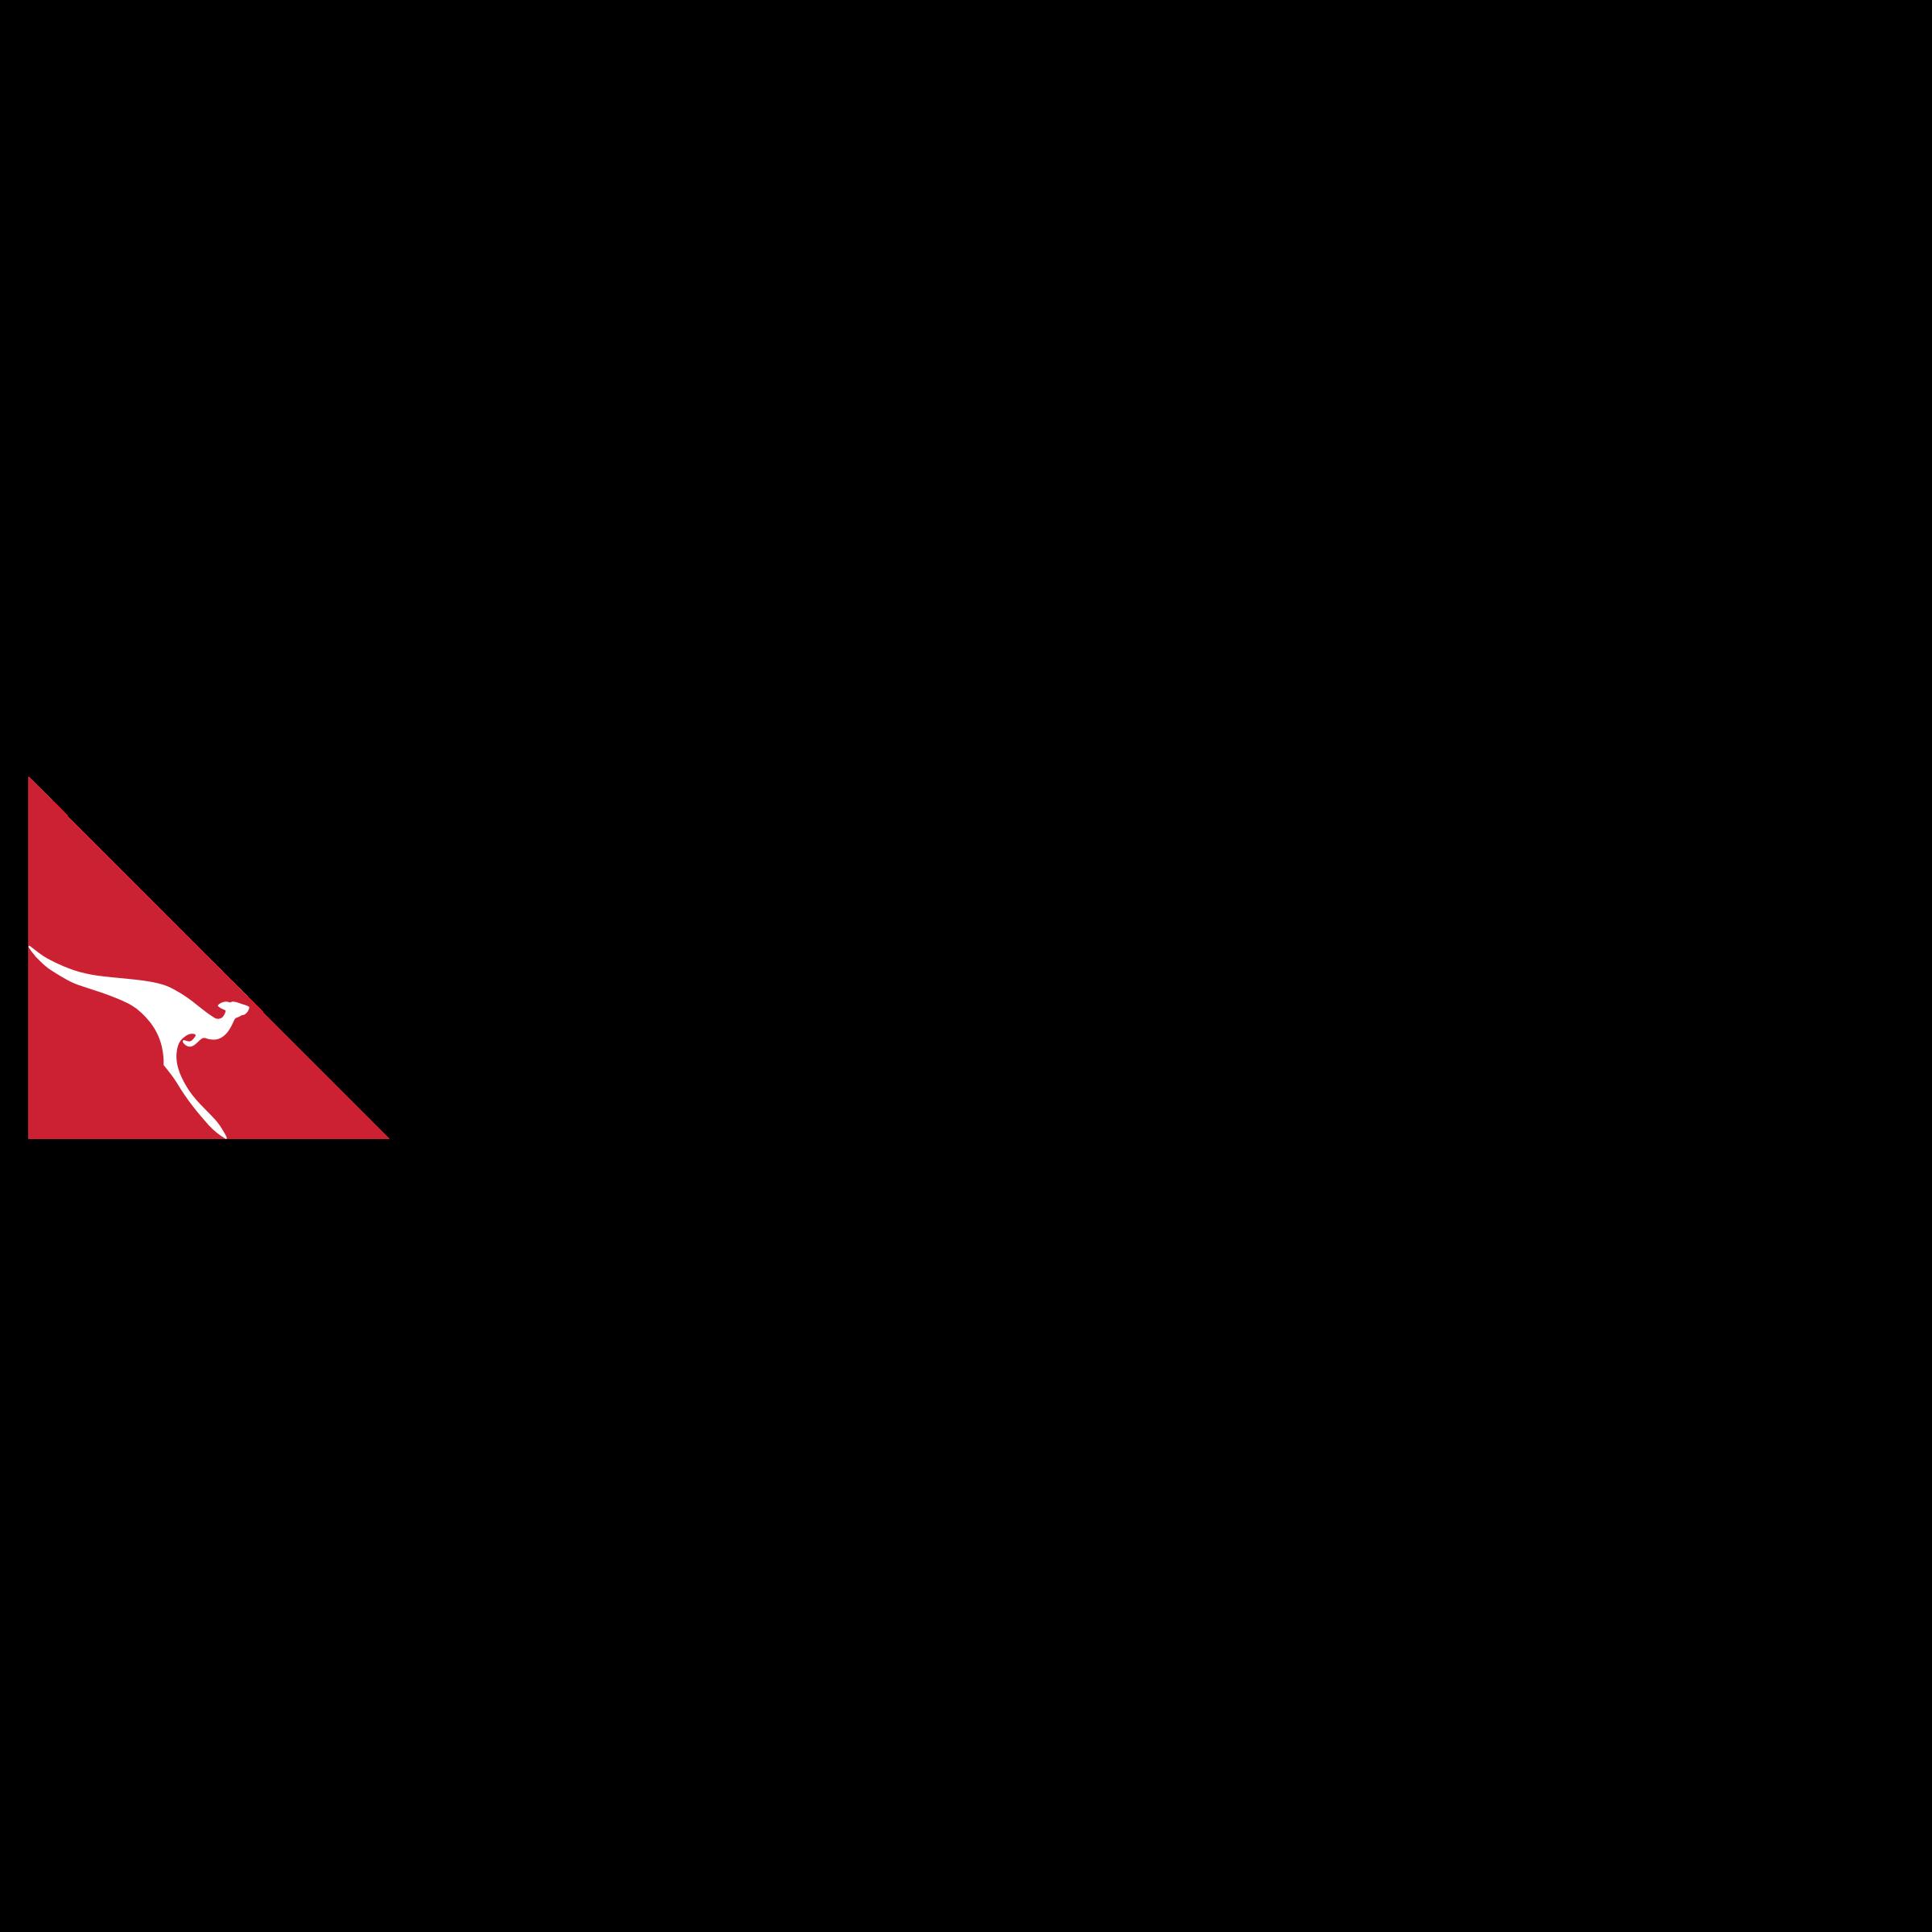 qantas-3-logo-png-transparent.png